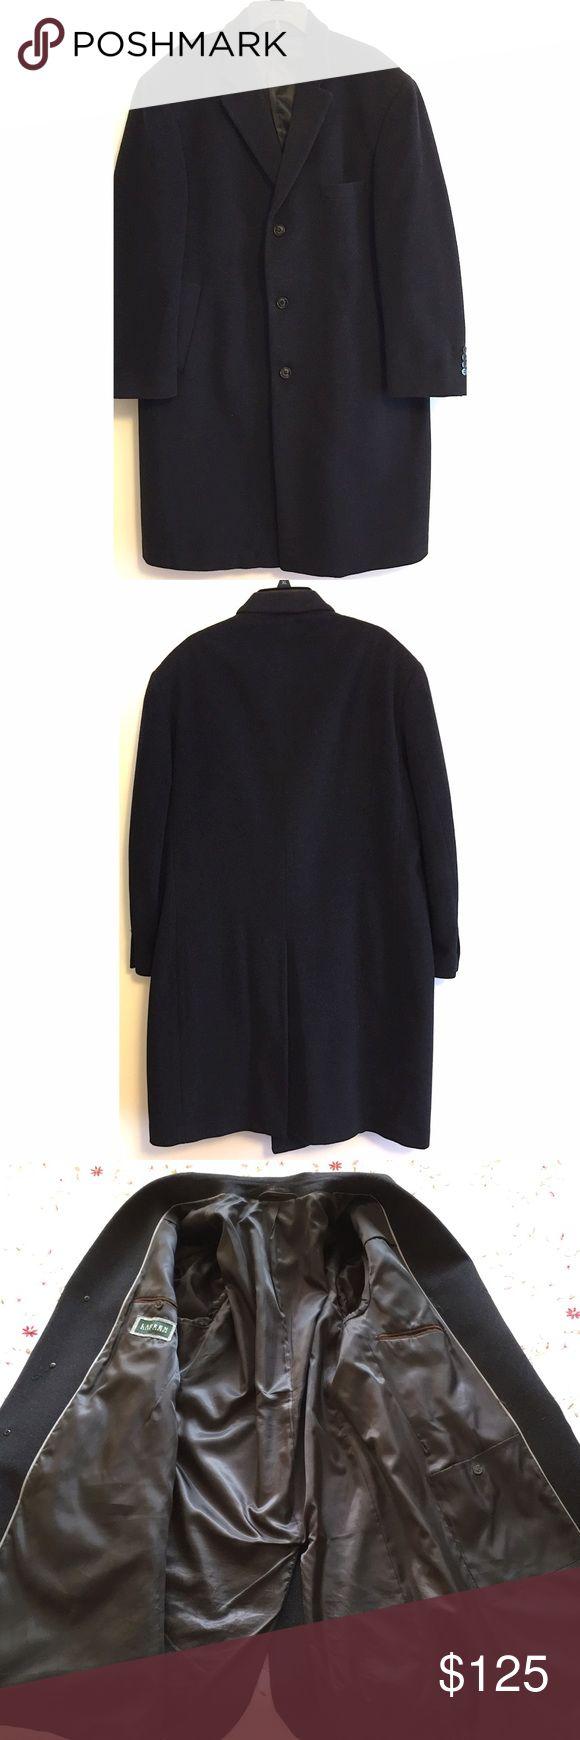 🔻LOWEST Ralph Lauren men's overcoat Wool and cashmere blend men's overcoat. Size 44 Short. Excellent condition. Shell: 90% wool, 10% cashmere. Lining: 100% polyester. Dry clean only. Lauren Ralph Lauren Jackets & Coats Pea Coats